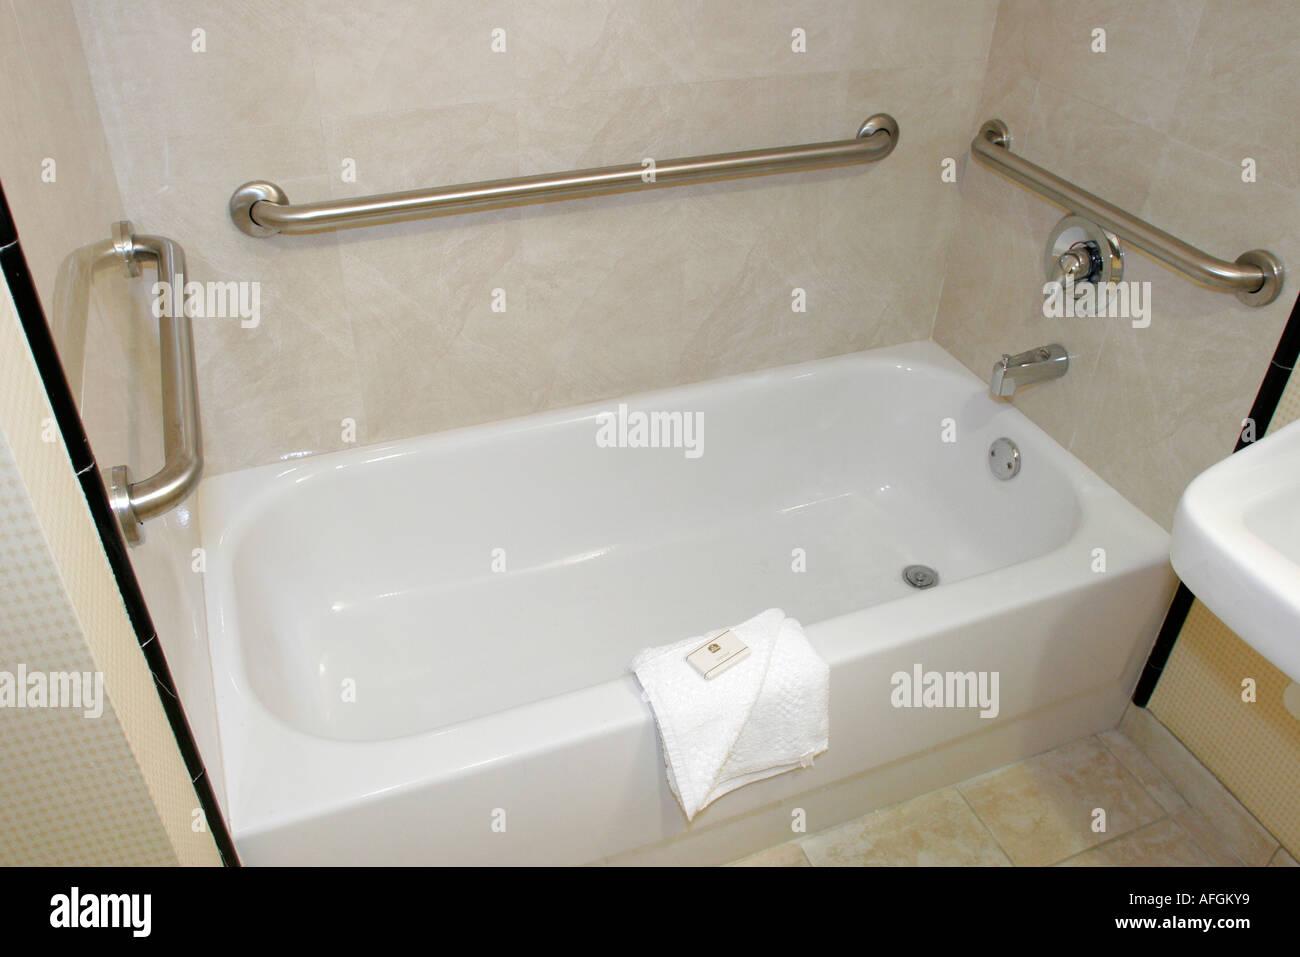 Vasca Da Bagno Handicappati : Florida fort pierce best western motel handicap sala da bagno